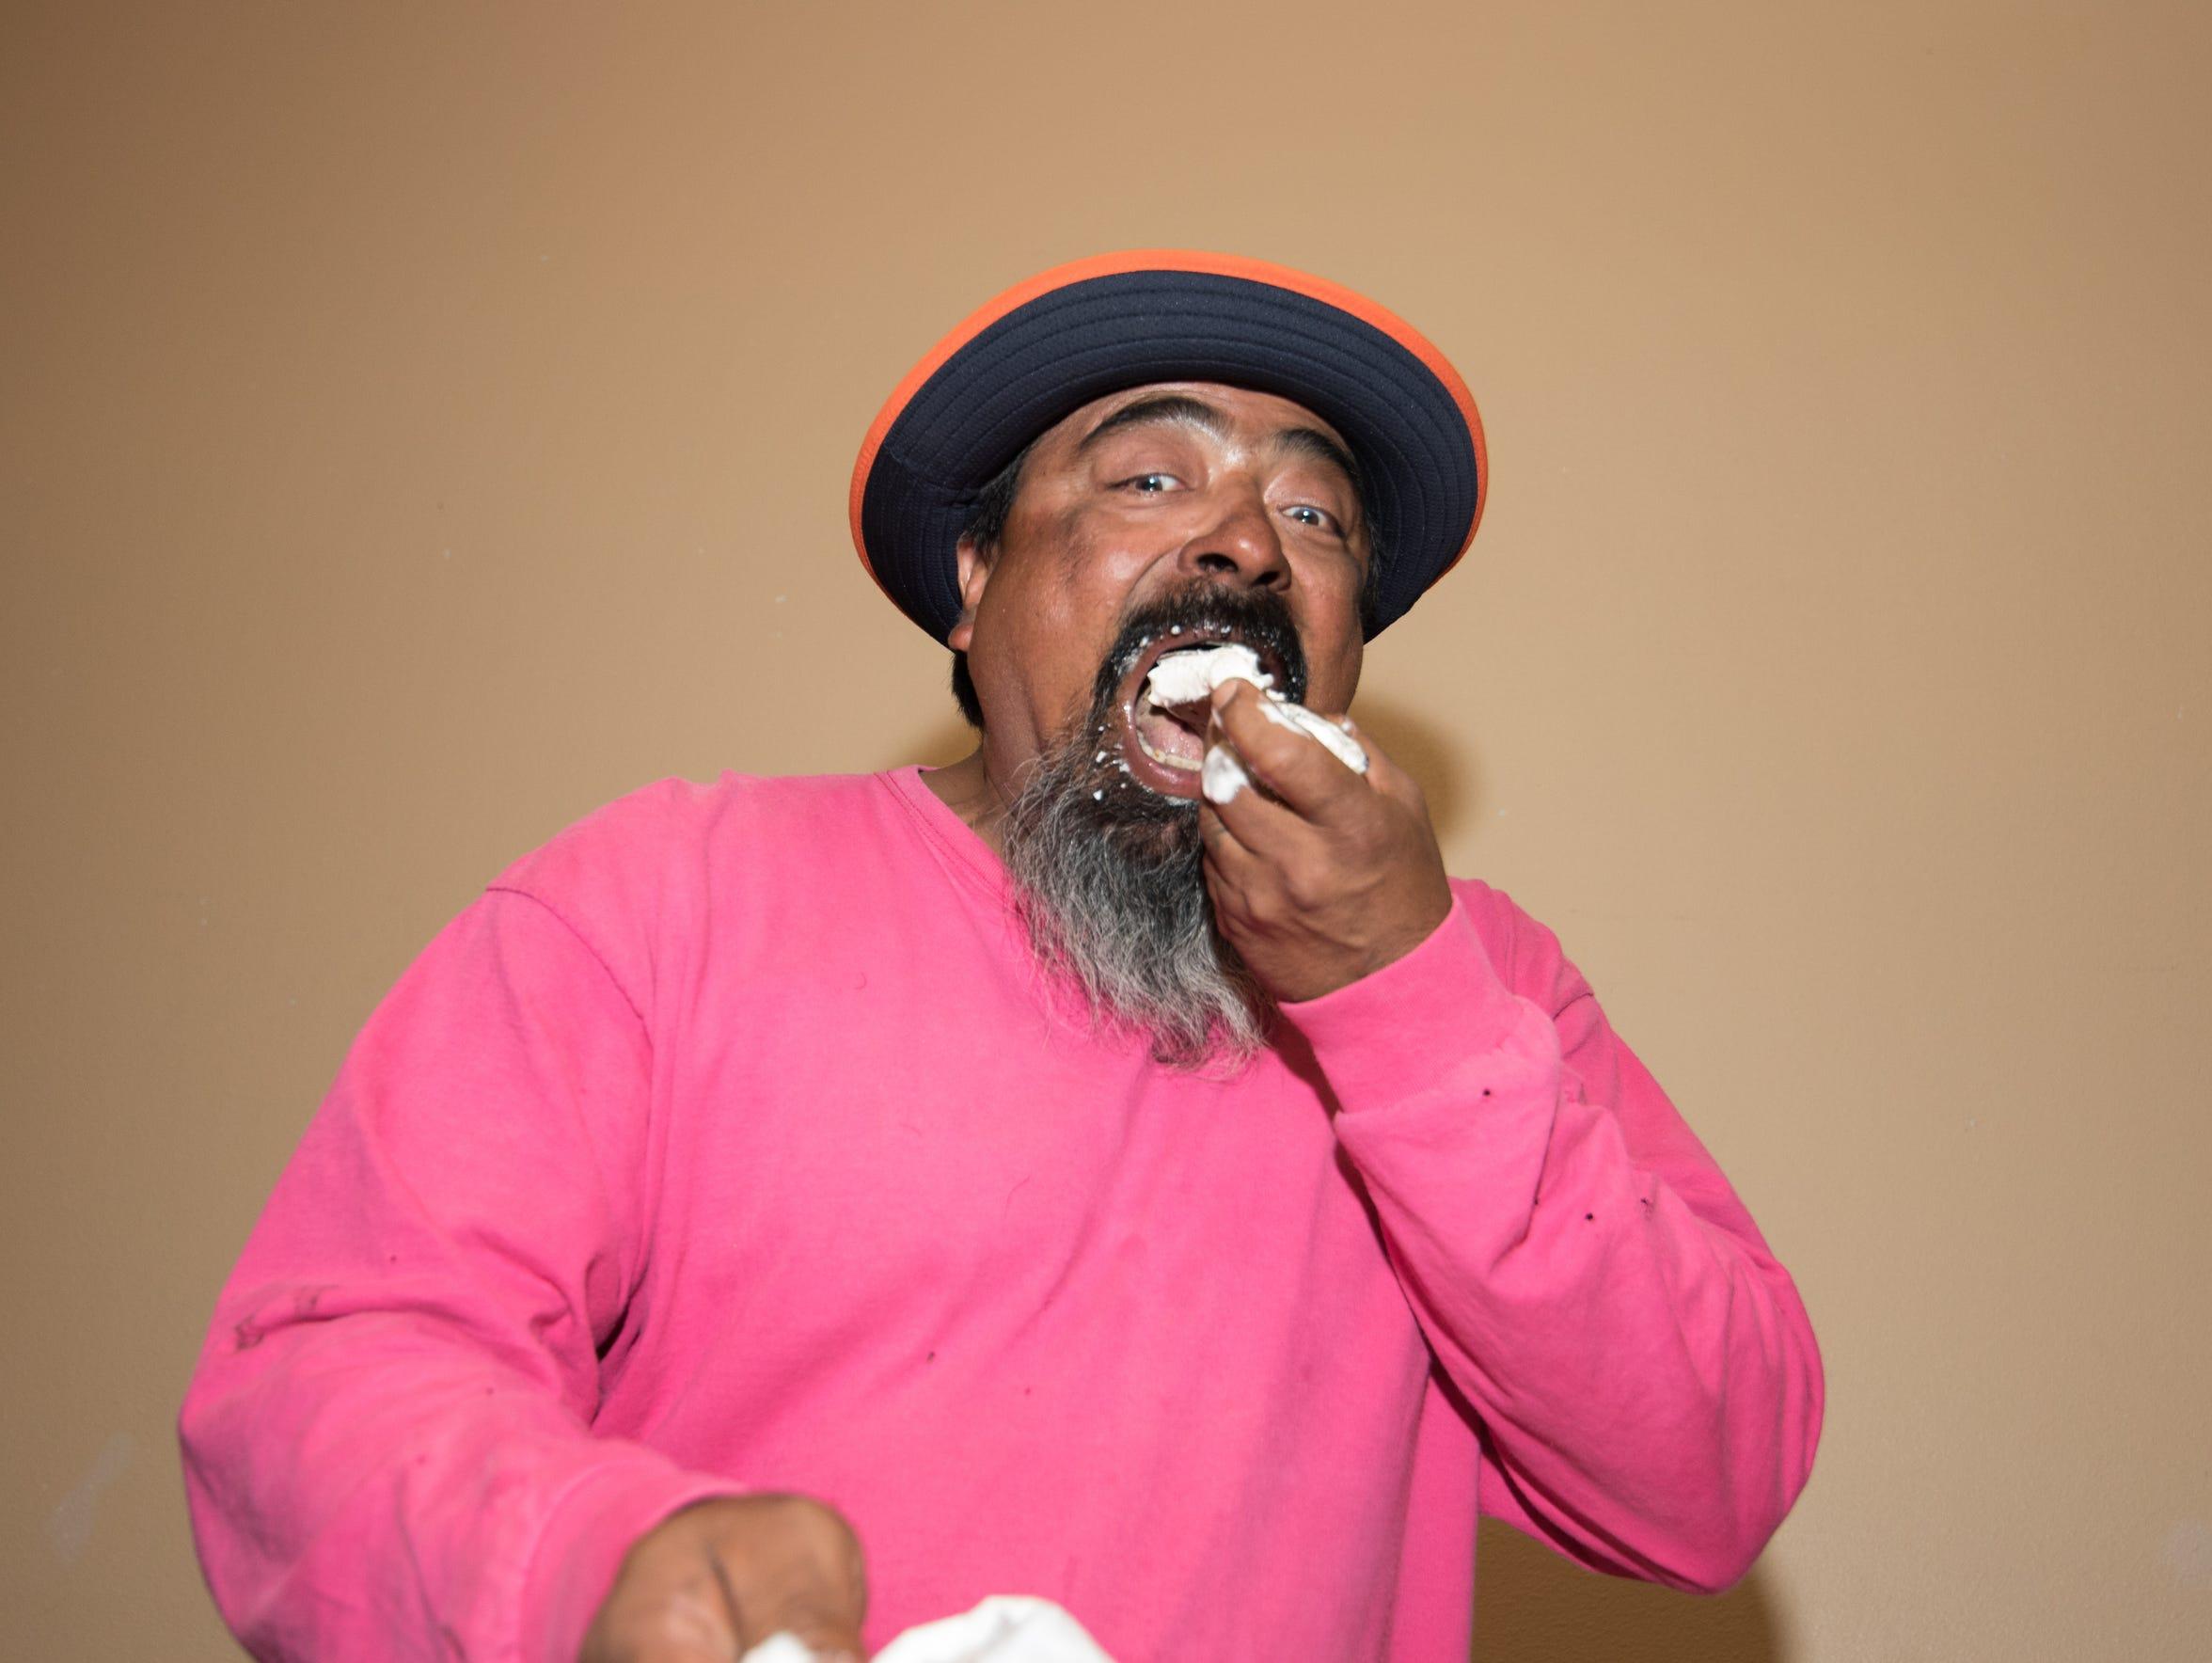 Ralph Araiza eats one of 13 ice cream bars for the